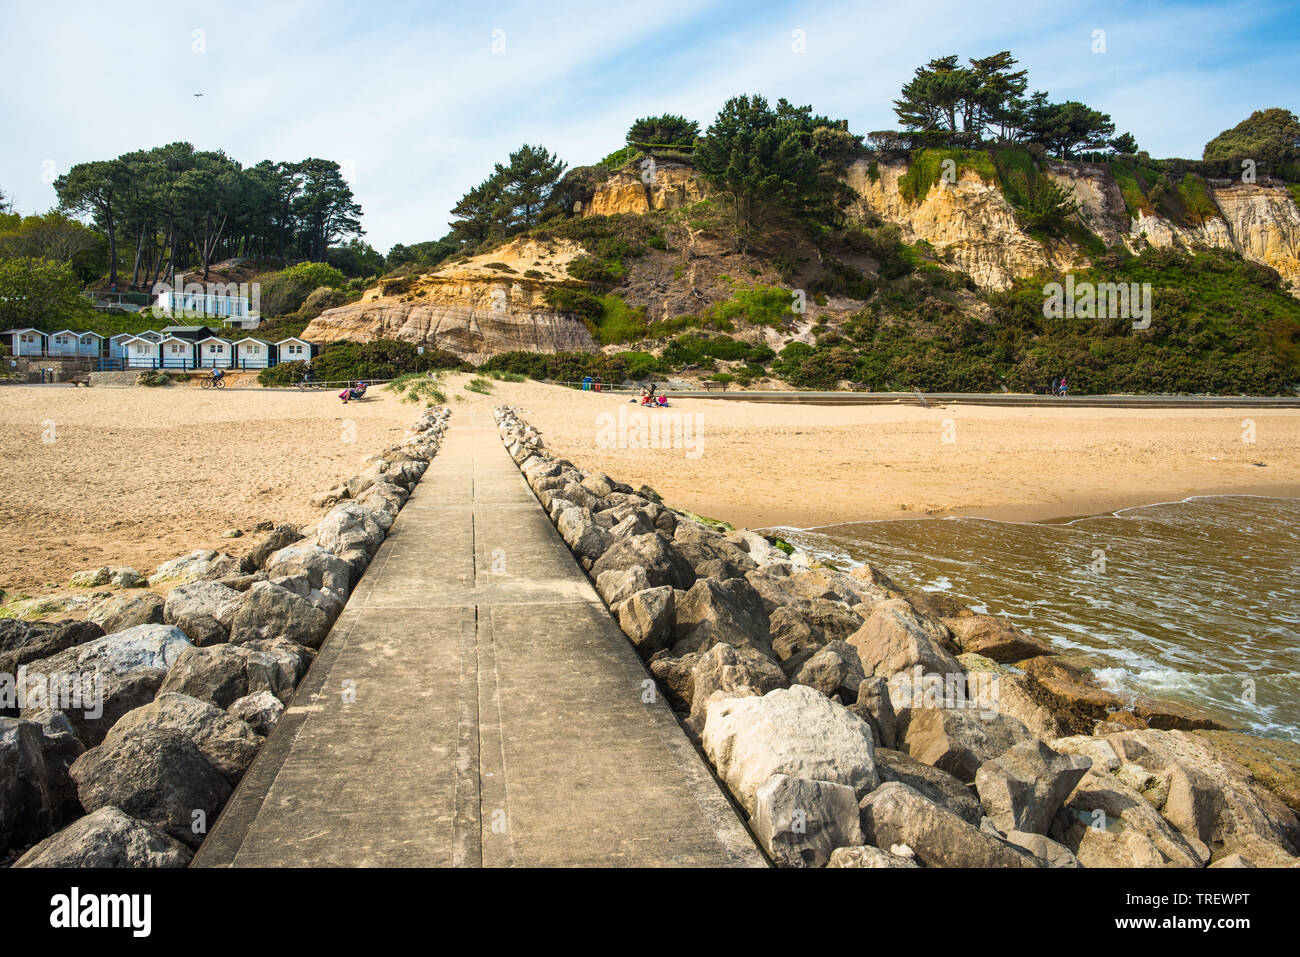 Stone Groynes on Branksome Dene Chine beach near Bournemouth in Dorest, England, UK. - Stock Image